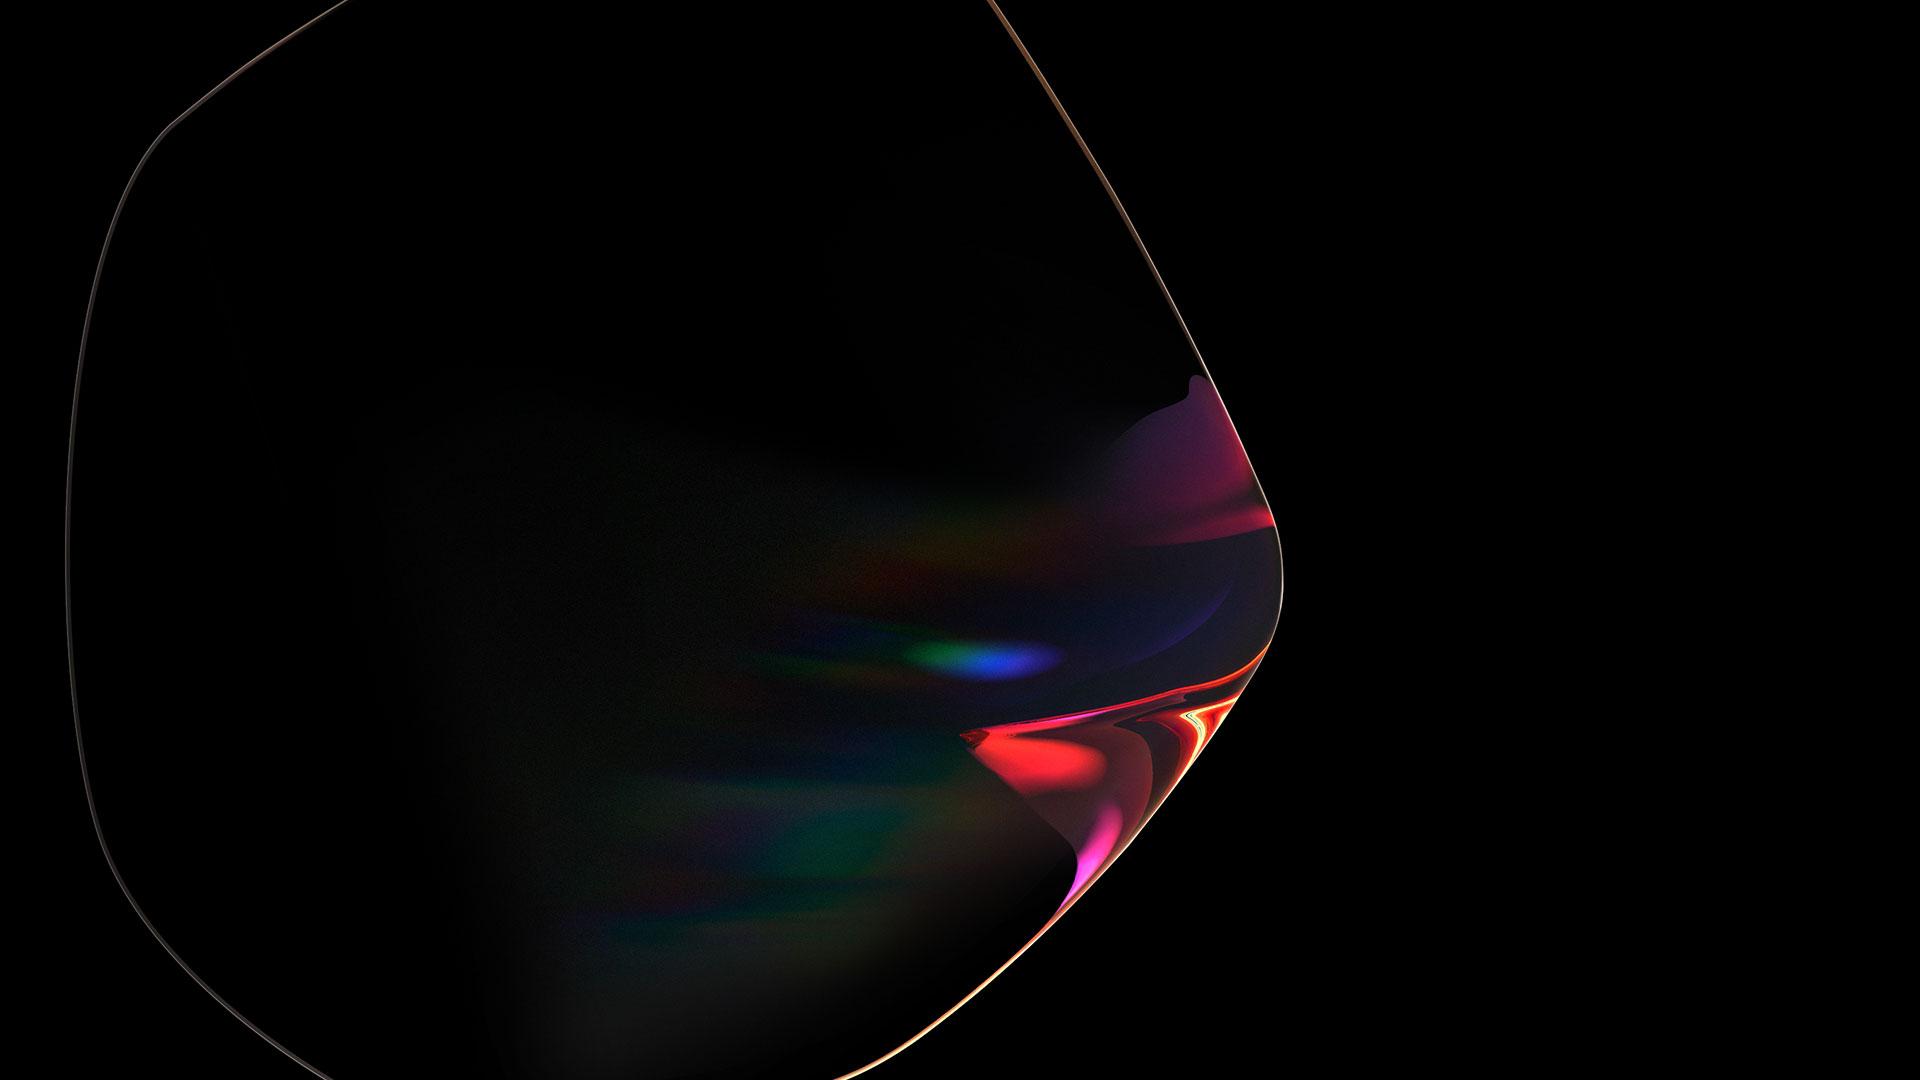 دانلود تصاویر زمینه گلکسی نوت ۱۰ (Galaxy Note 10)